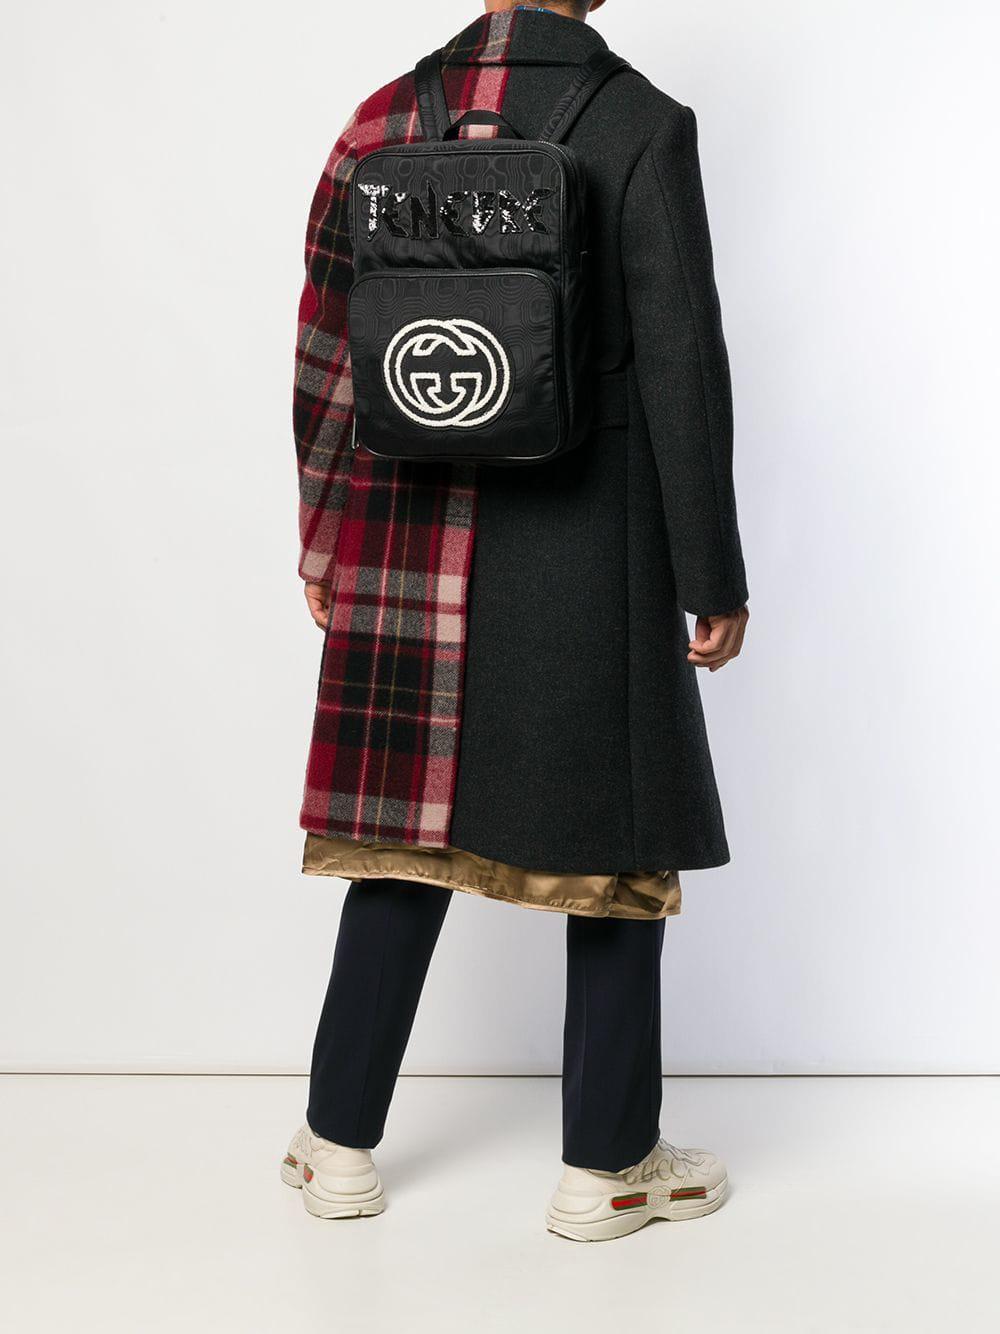 c45c1e62bfc Lyst - Gucci GG Logo Backpack in Black for Men